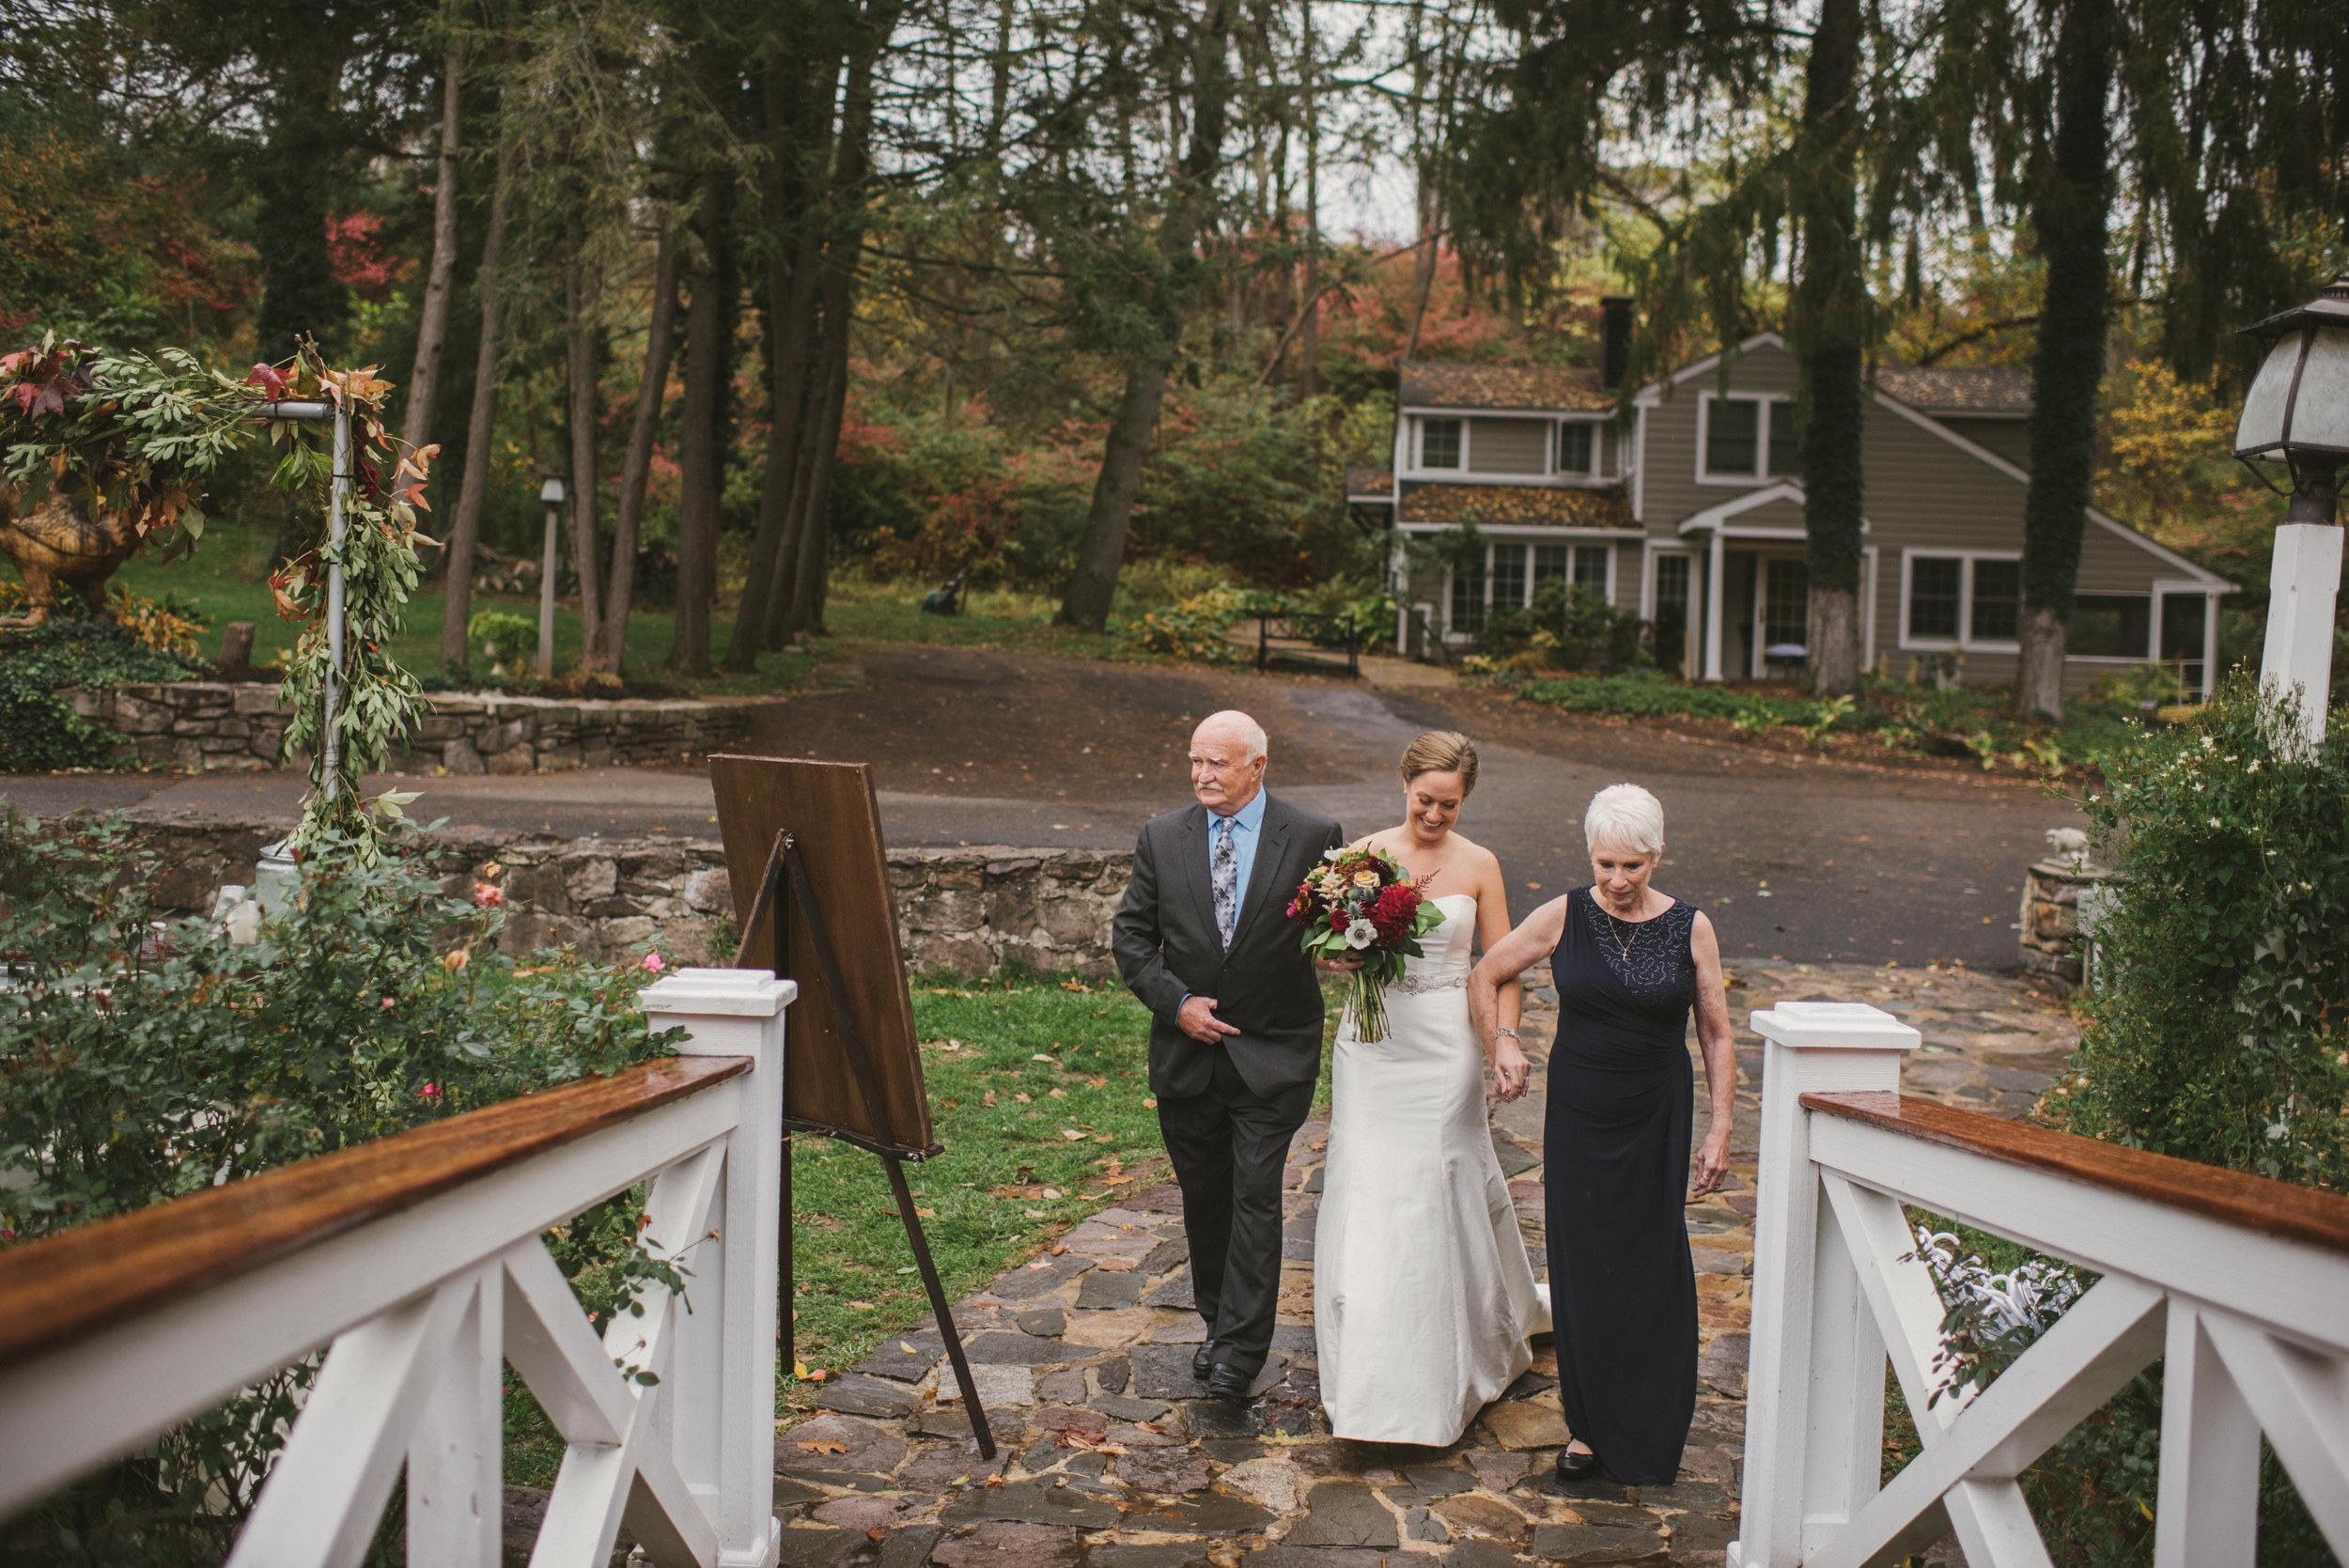 JACQUELINE & ANDREW WARSHAWER -BROOKMILL FARM FALL WEDDING - INTIMATE WEDDING PHOTOGRAPHER - TWOTWENTY by CHI-CHI AGBIM-212.jpg